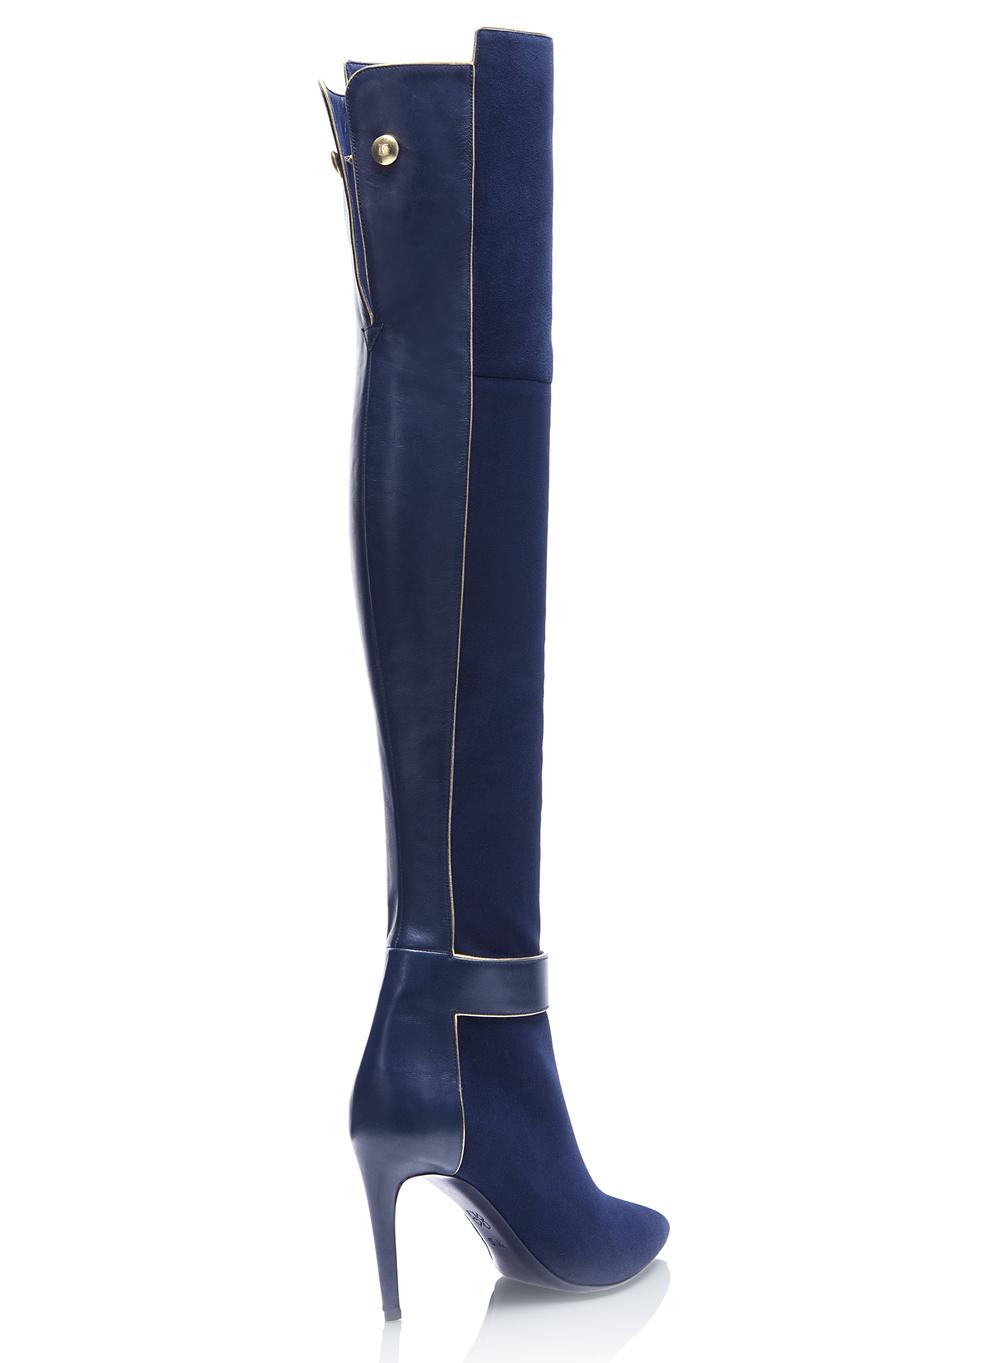 Storm Boots - Stivaleria Cavallin 1.jpg